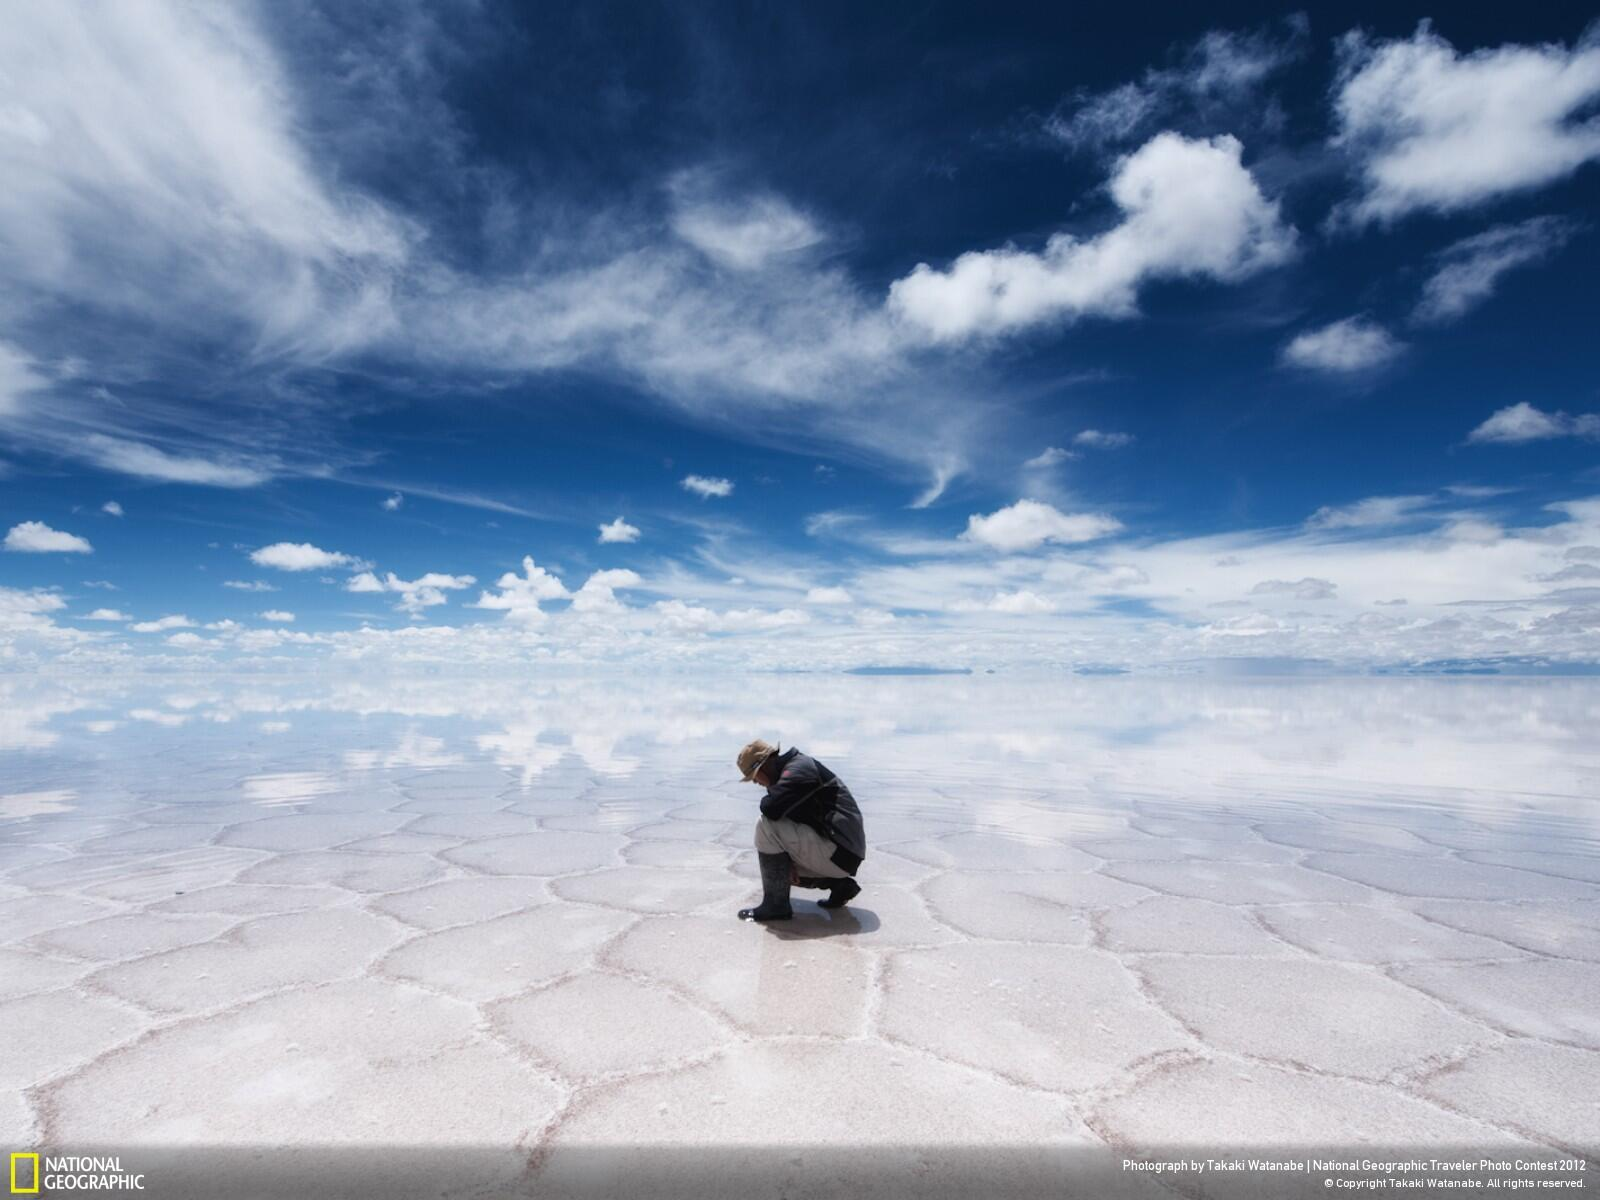 Reflection at the World's Largest Salt Flat, Salar de Uyuni, Bolivia http://t.co/c36h6tos3X